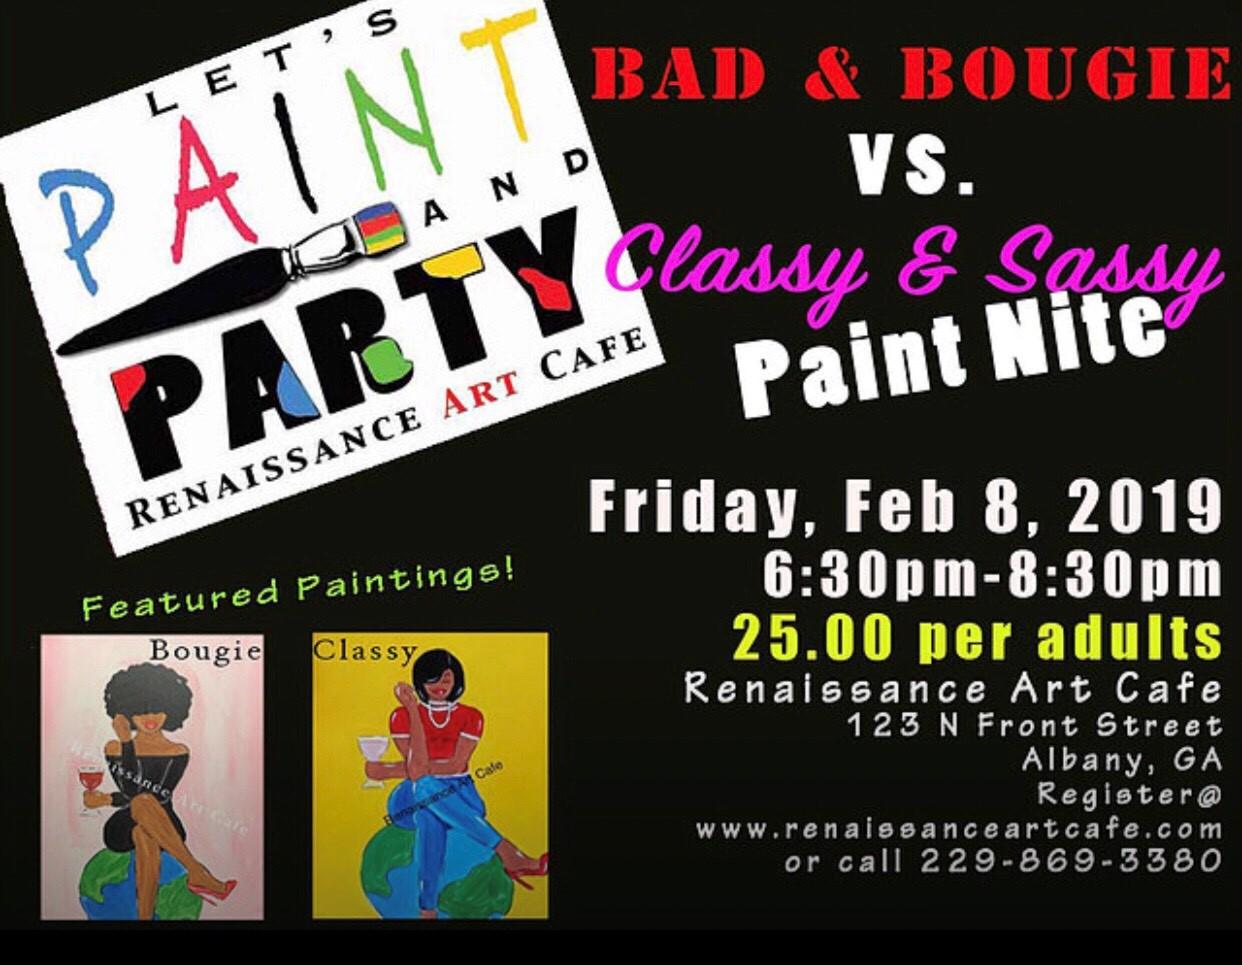 Bad & Bougie vs Classy & Sassy